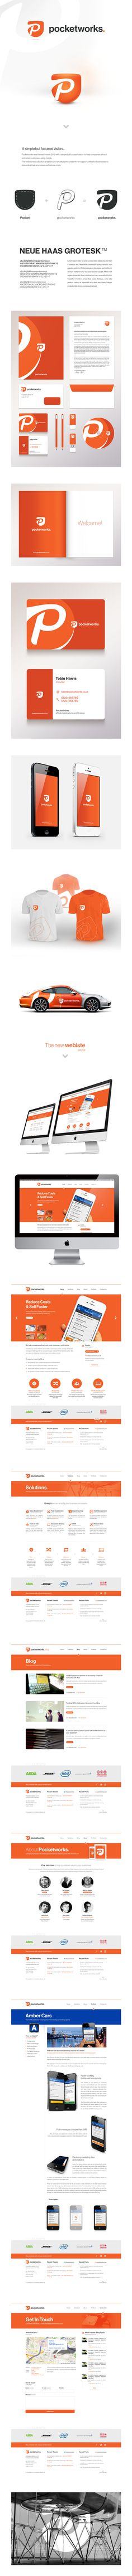 Pocketworks visual identity by Tomasz Zagórski Corporate Design, Corporate Branding, Brand Identity Design, Branding Design, Logo Design, Identity Branding, Graphic Design, Packaging, Typography Logo